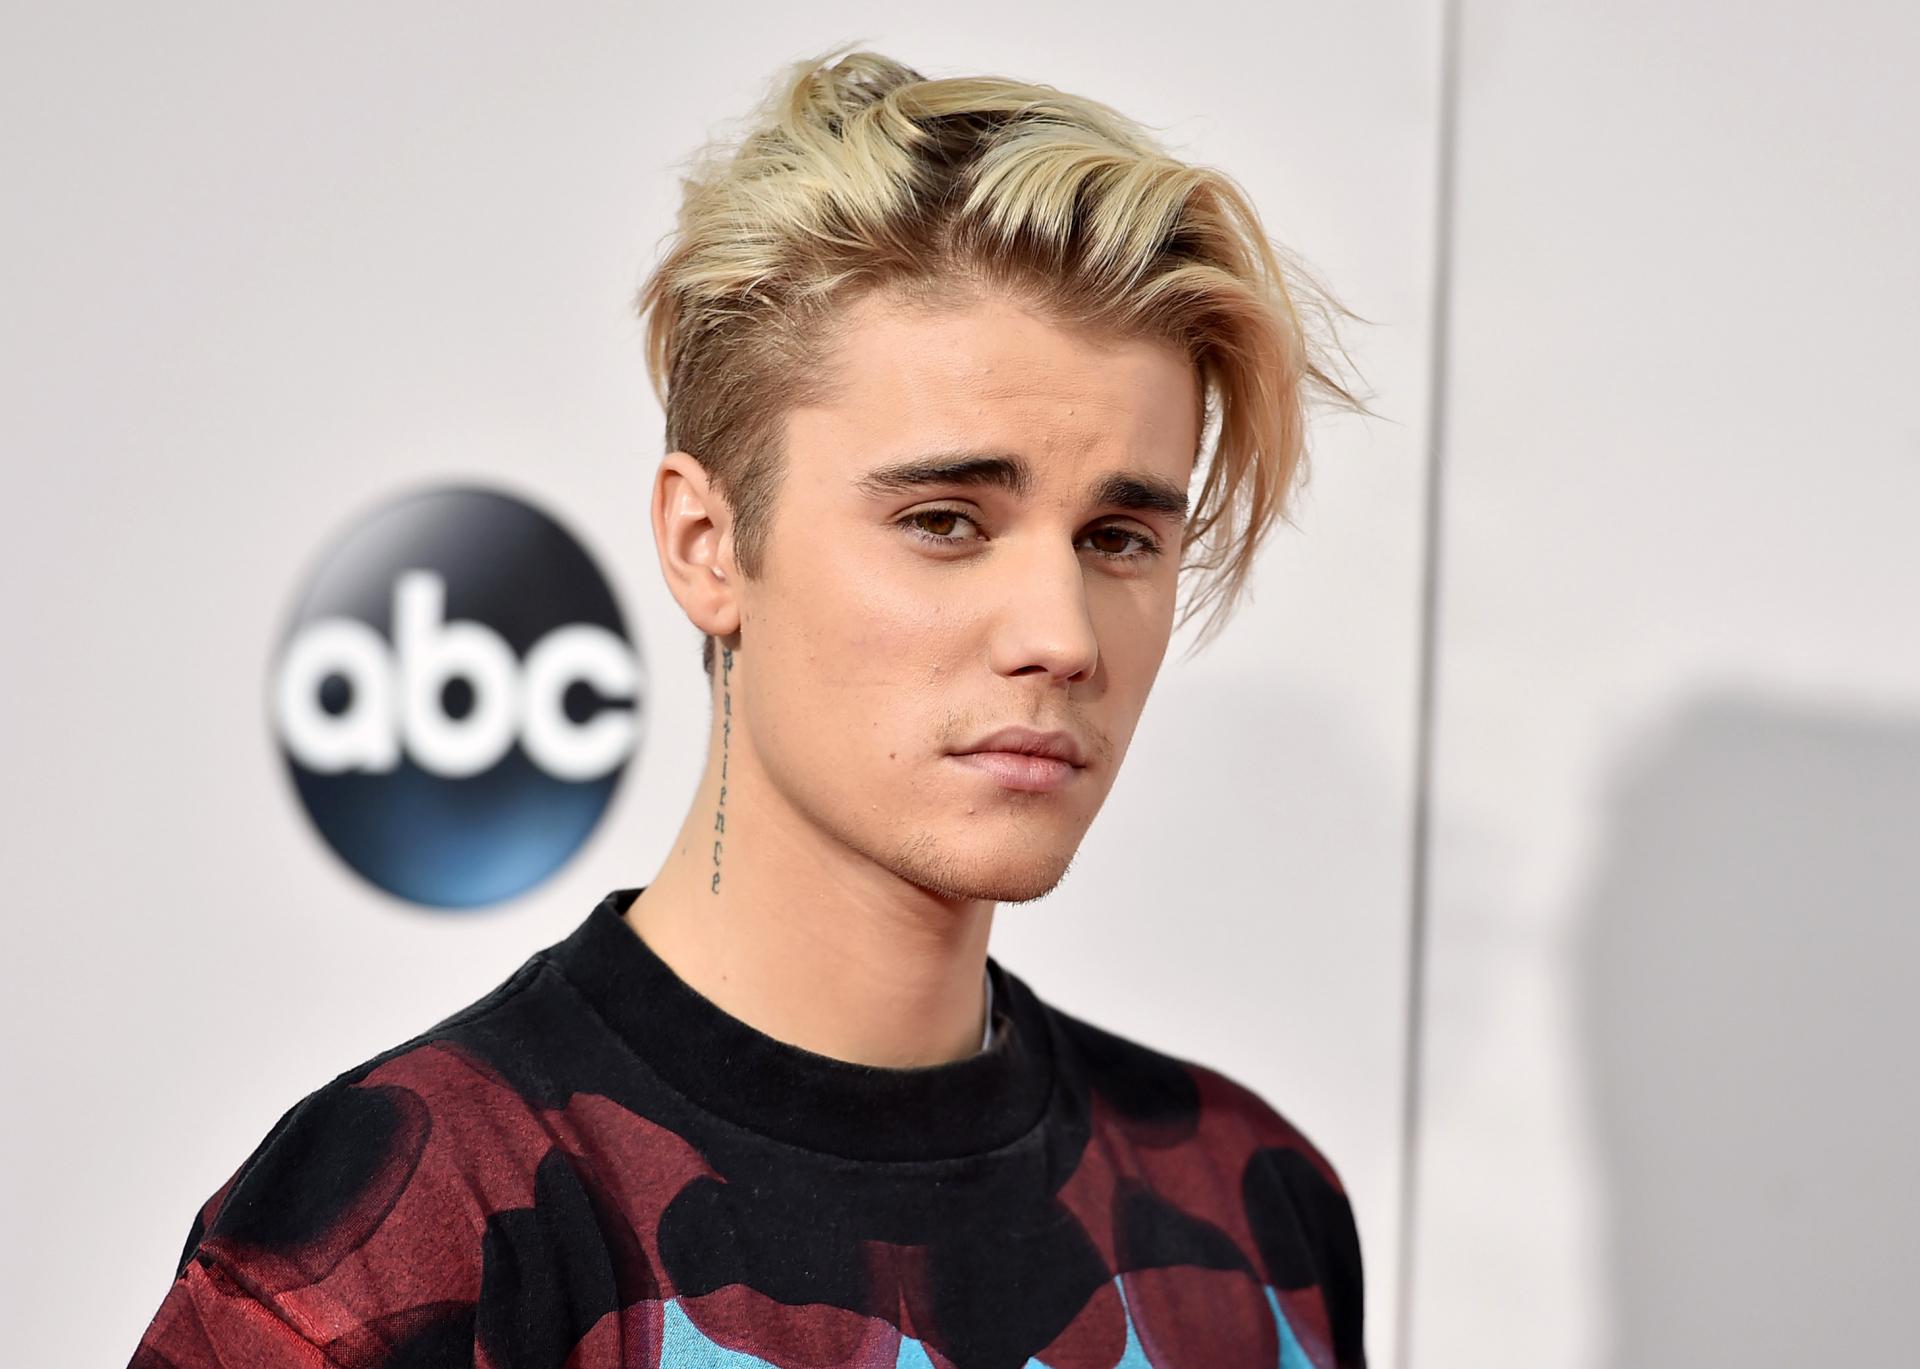 milyen nagy a Justin biebers fasz női csapdák